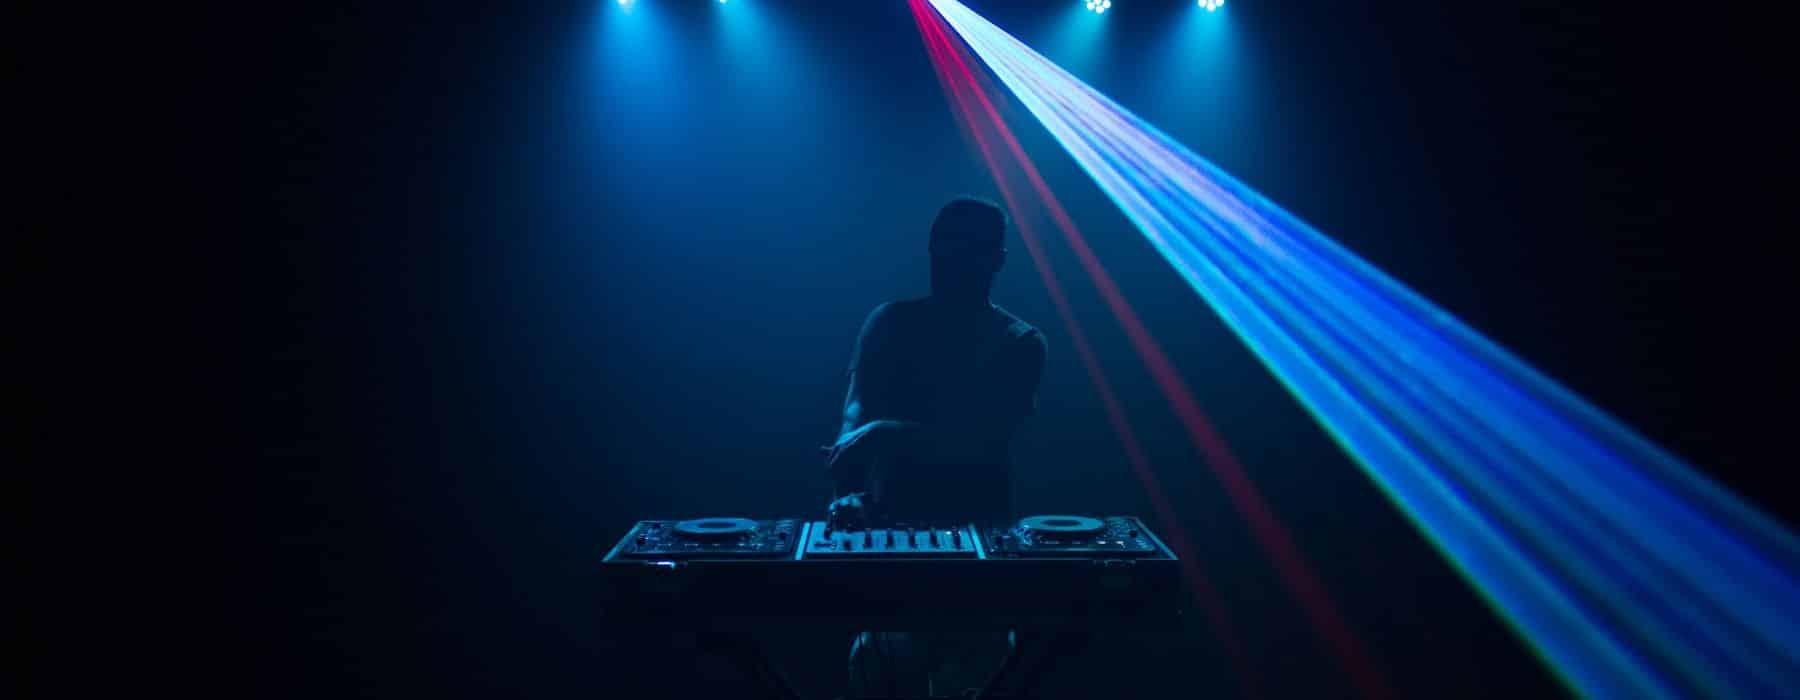 ANIMATION SOIRÉE DJ (1)